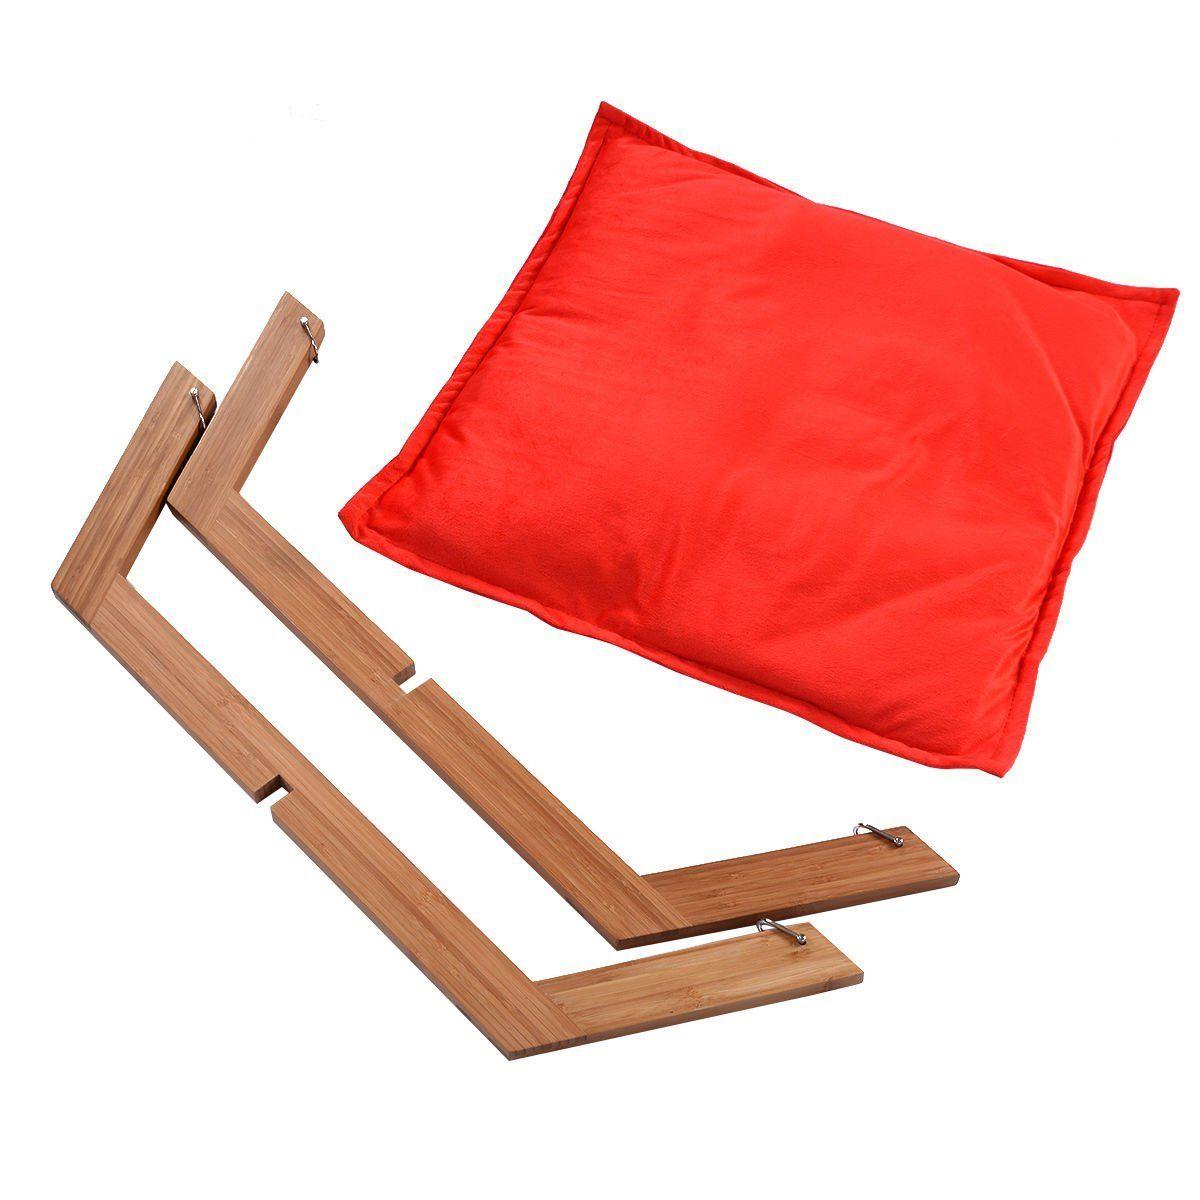 amazon     giantex pet hammock bed dog nap mat cat sleeping pad cushion bamboo the exotic jungle looks and wild ocelot cat   pet hammock hammock      rh   pinterest